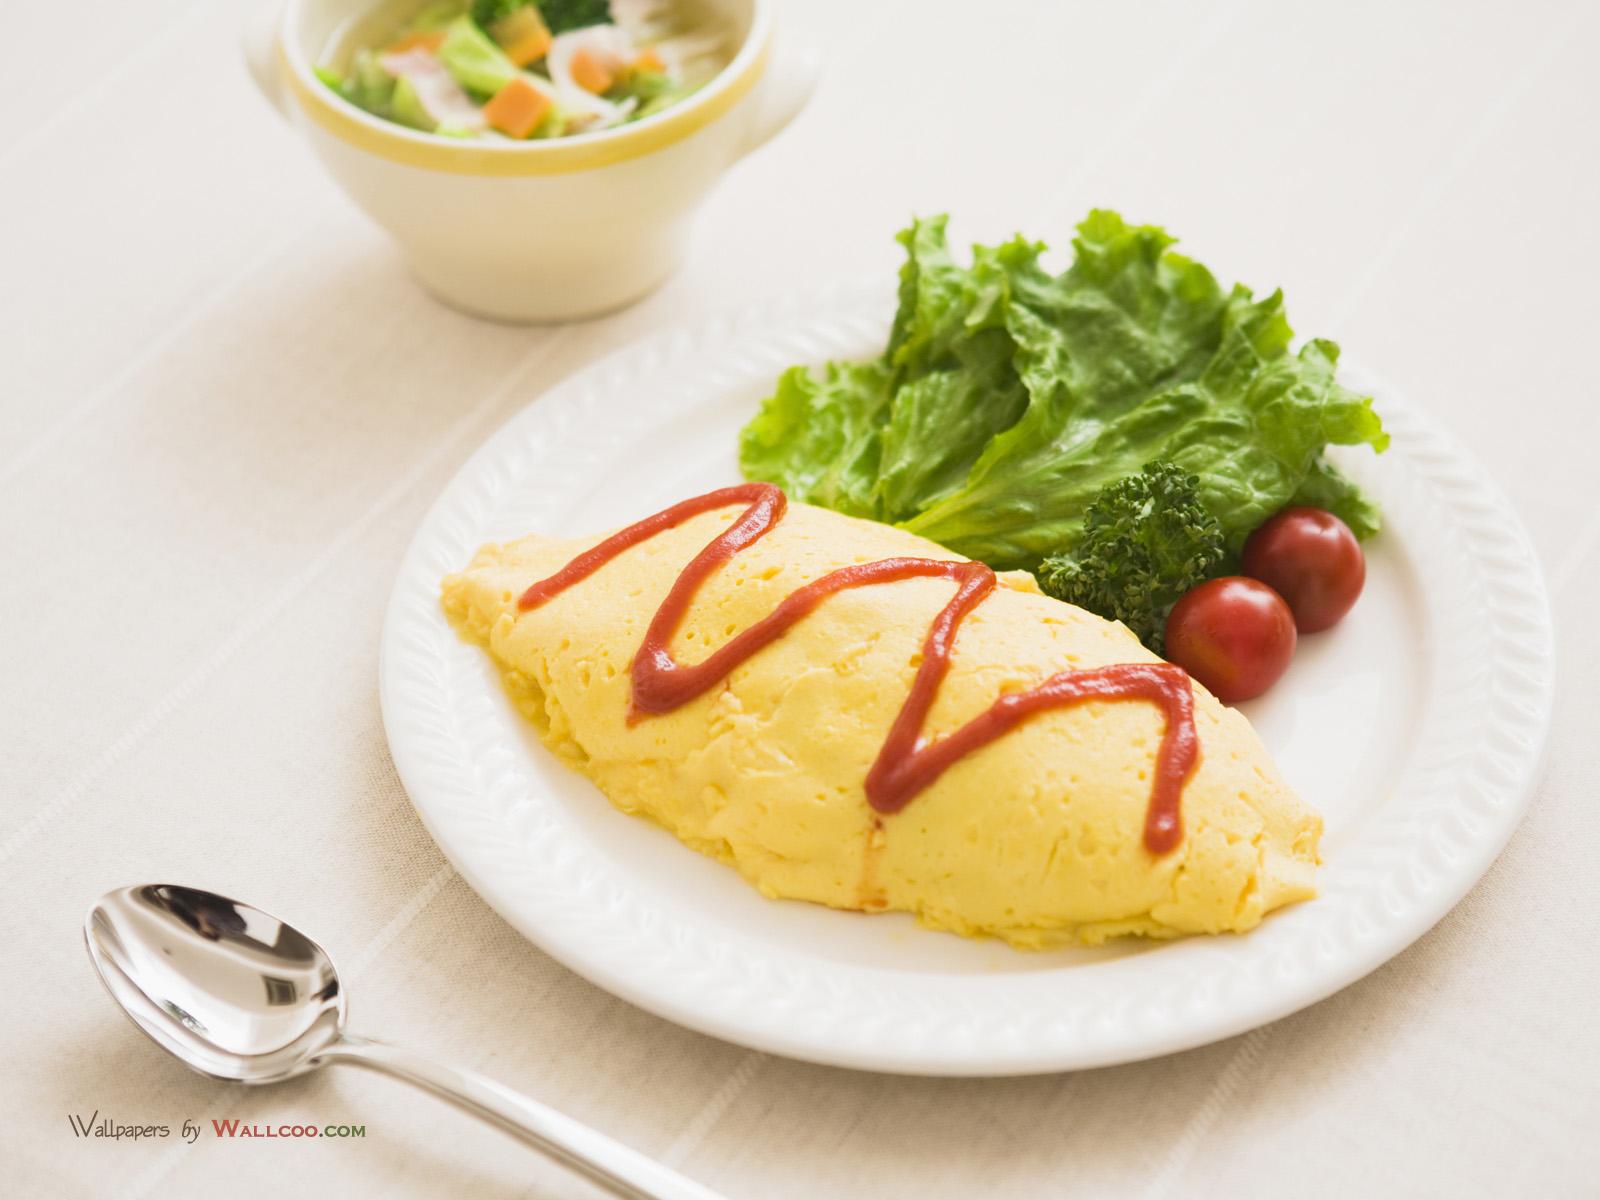 美食壁纸 西式早餐图片 Breakfast Photo Food